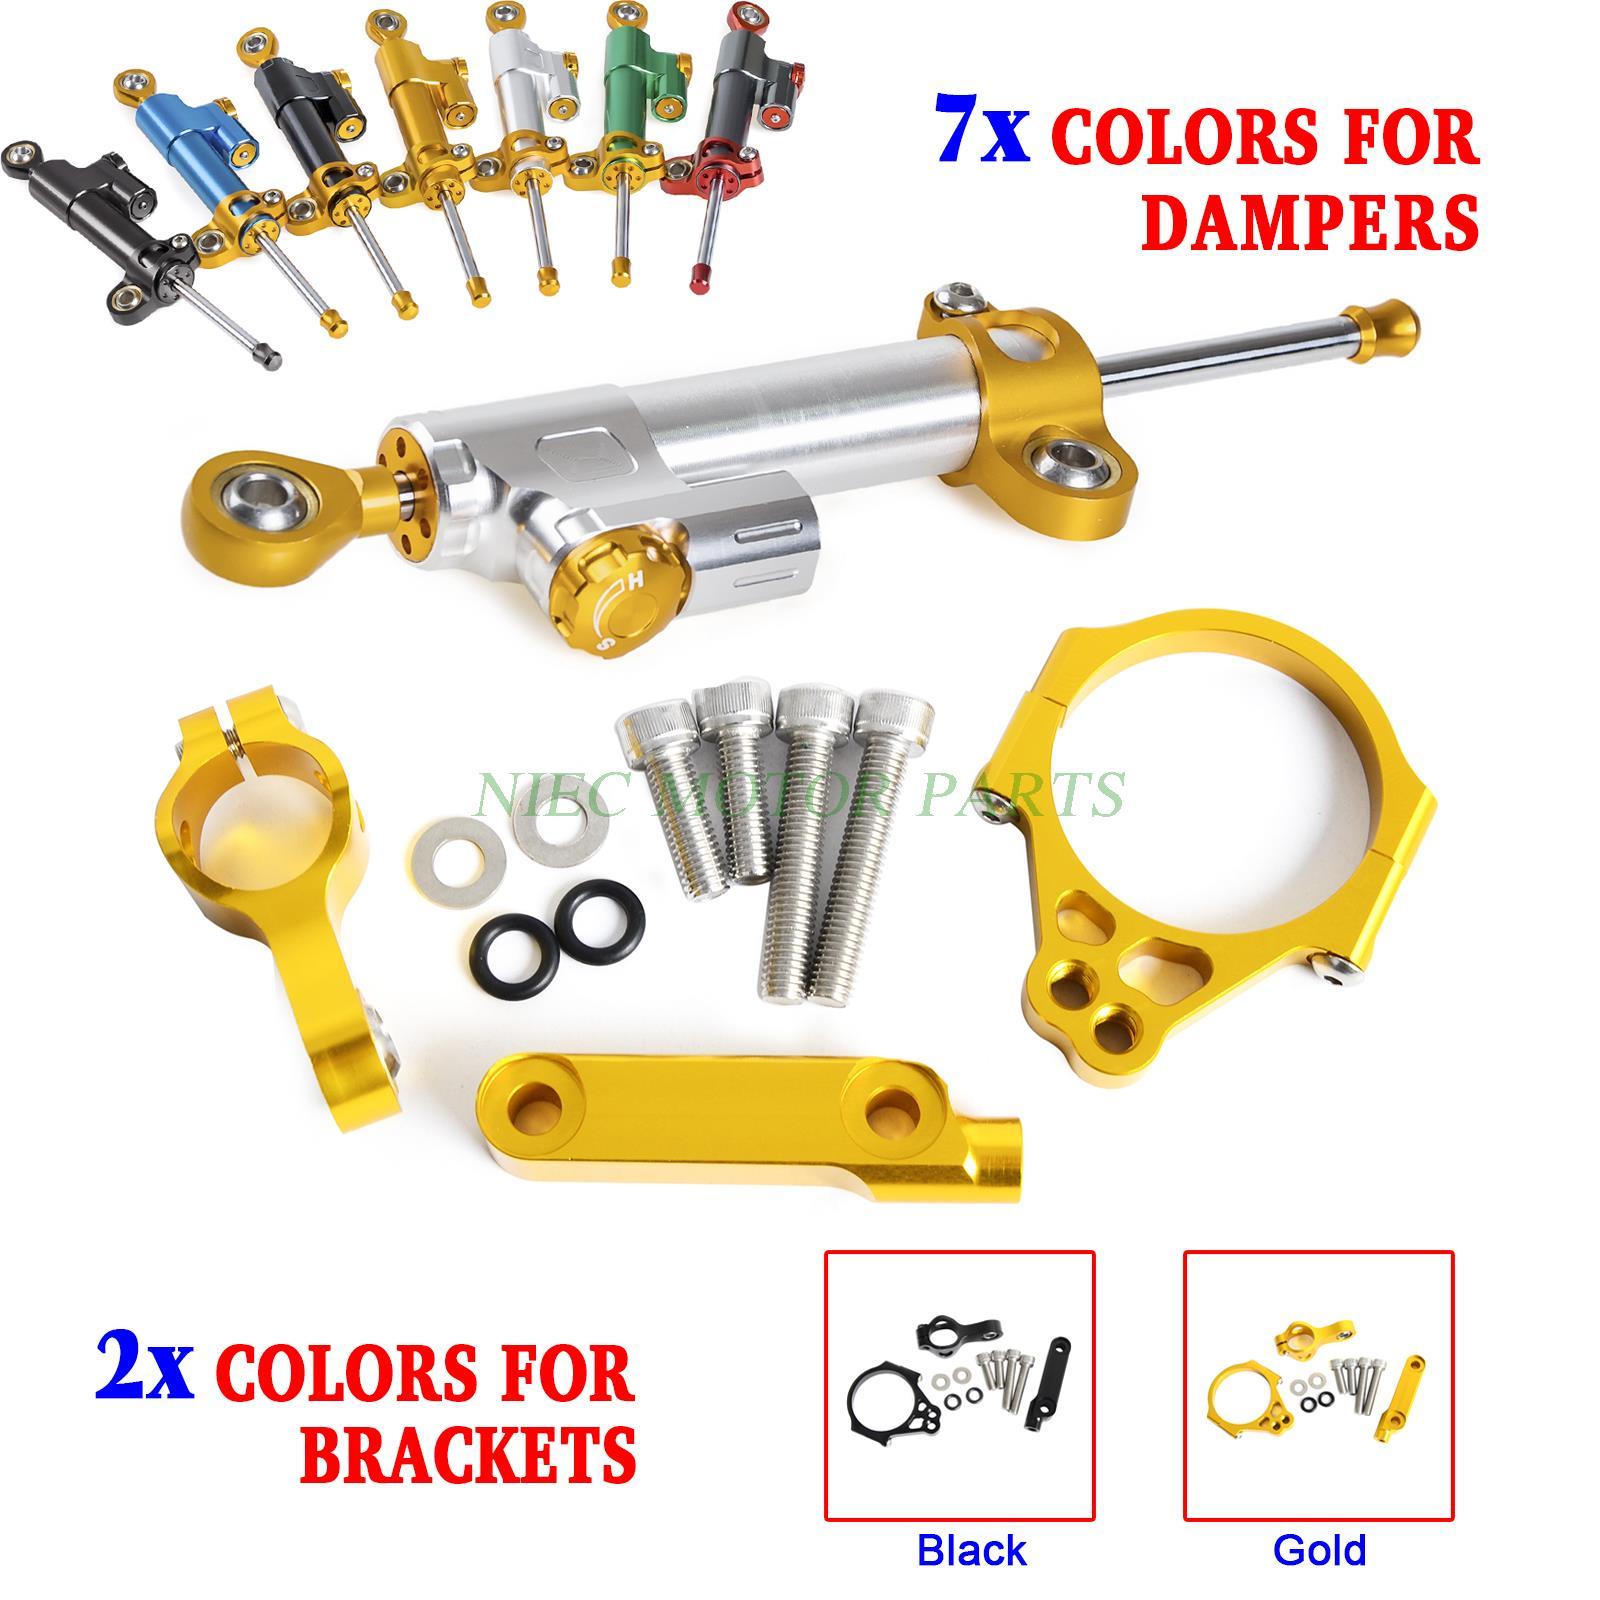 Motorcycle CNC Steering Damper Stabilizer & Bracket For Kawasaki  VERESYS 1000  2012 2013 2014 -2016